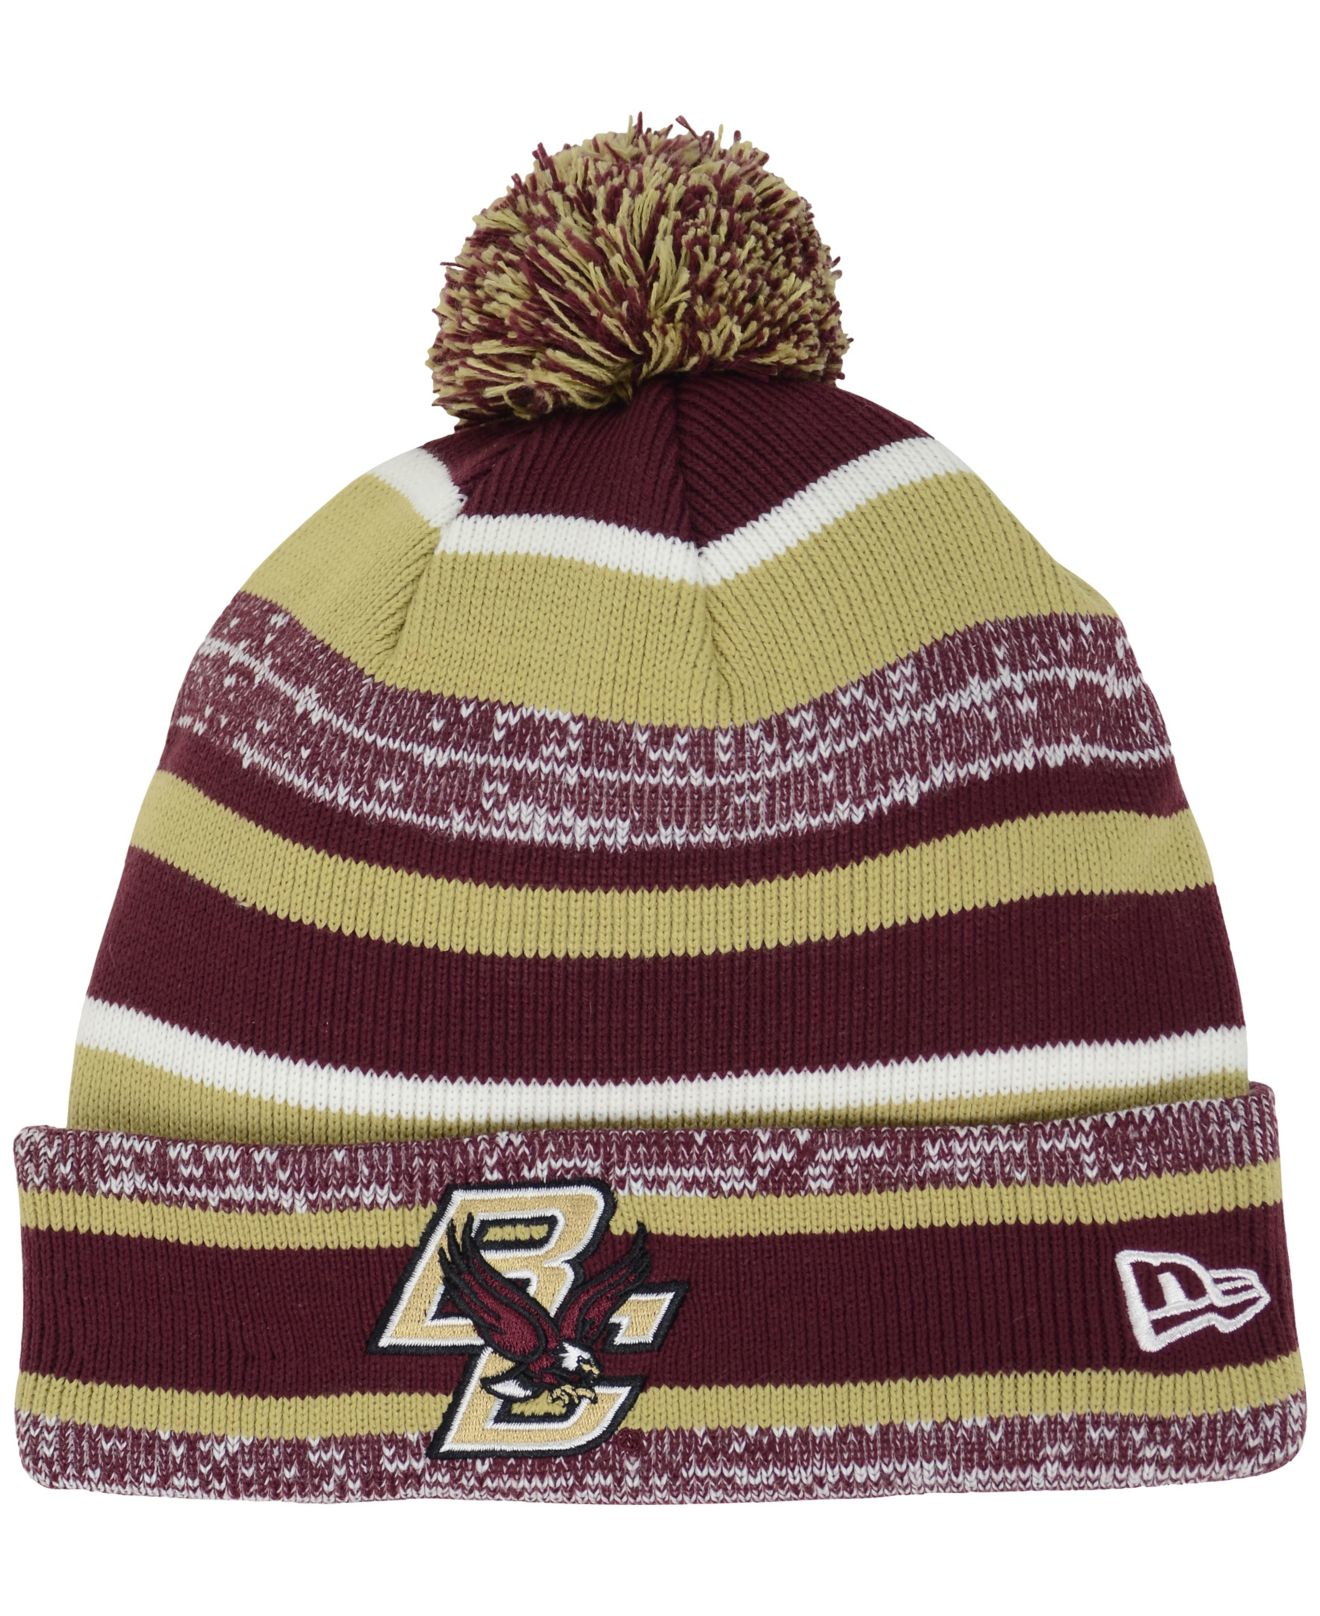 ... czech lyst ktz boston college eagles sport knit hat in purple for men  4aded 3ca4a 29b215bf0ce6